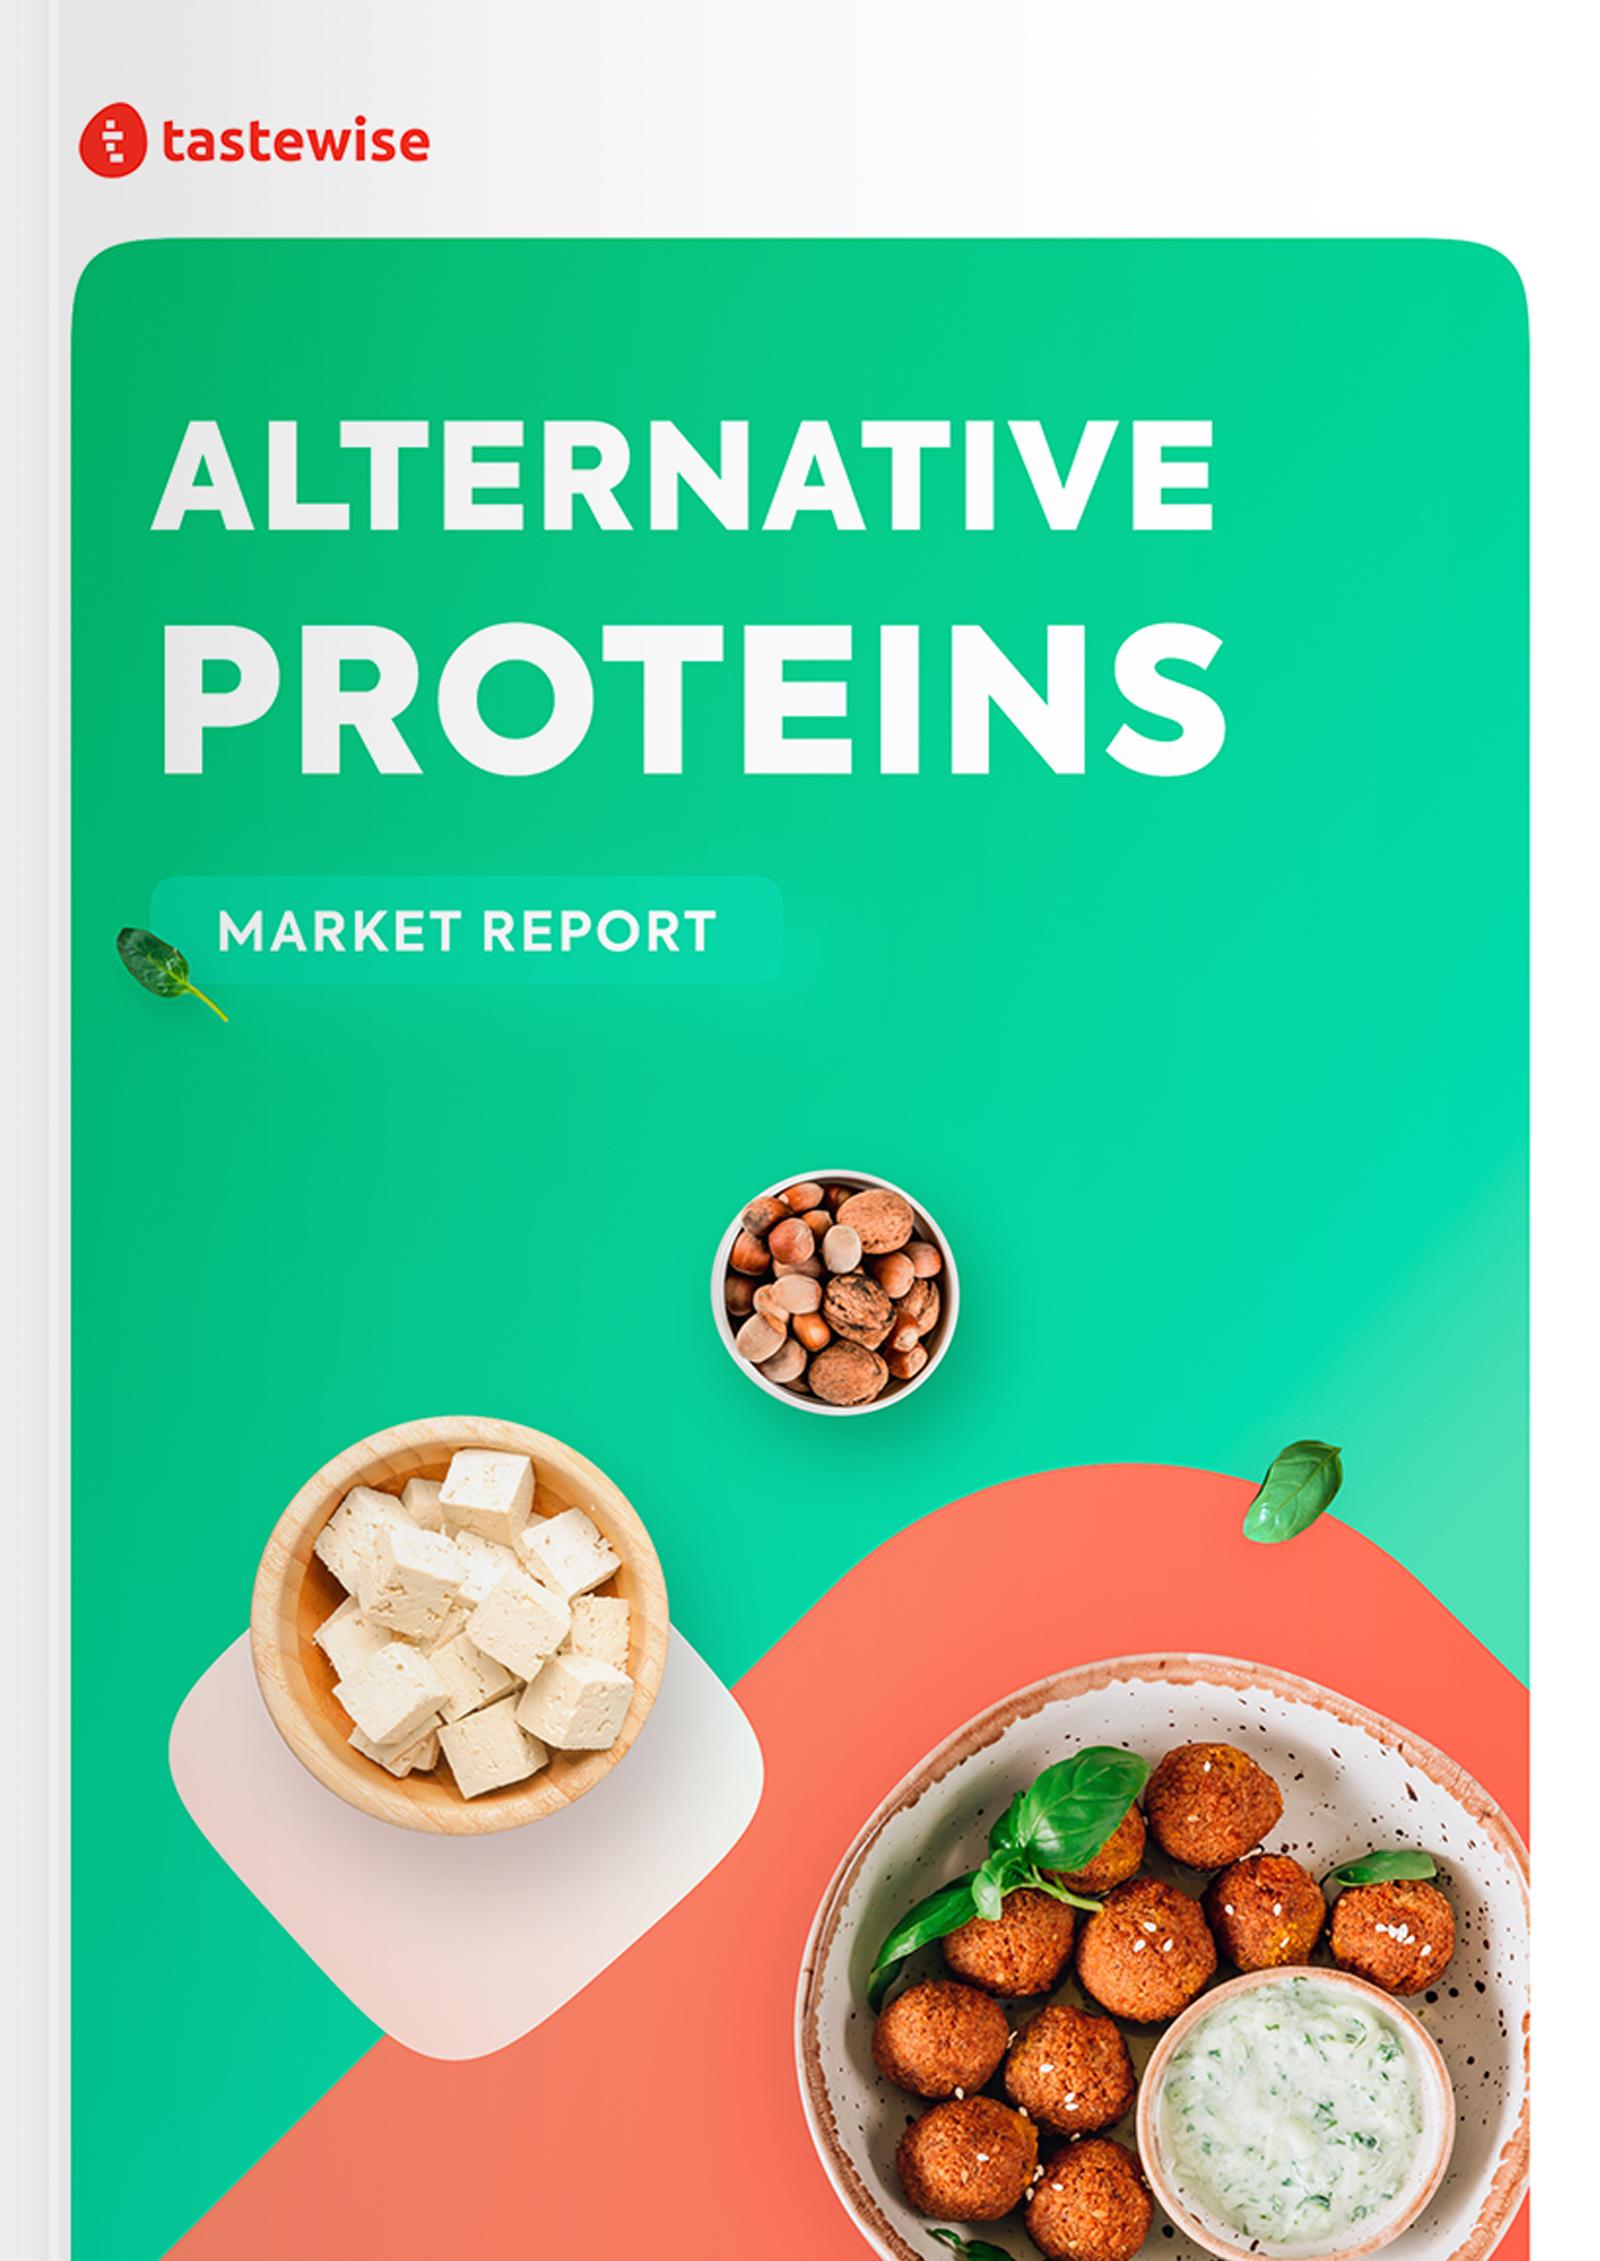 Market Report: Alternative Proteins